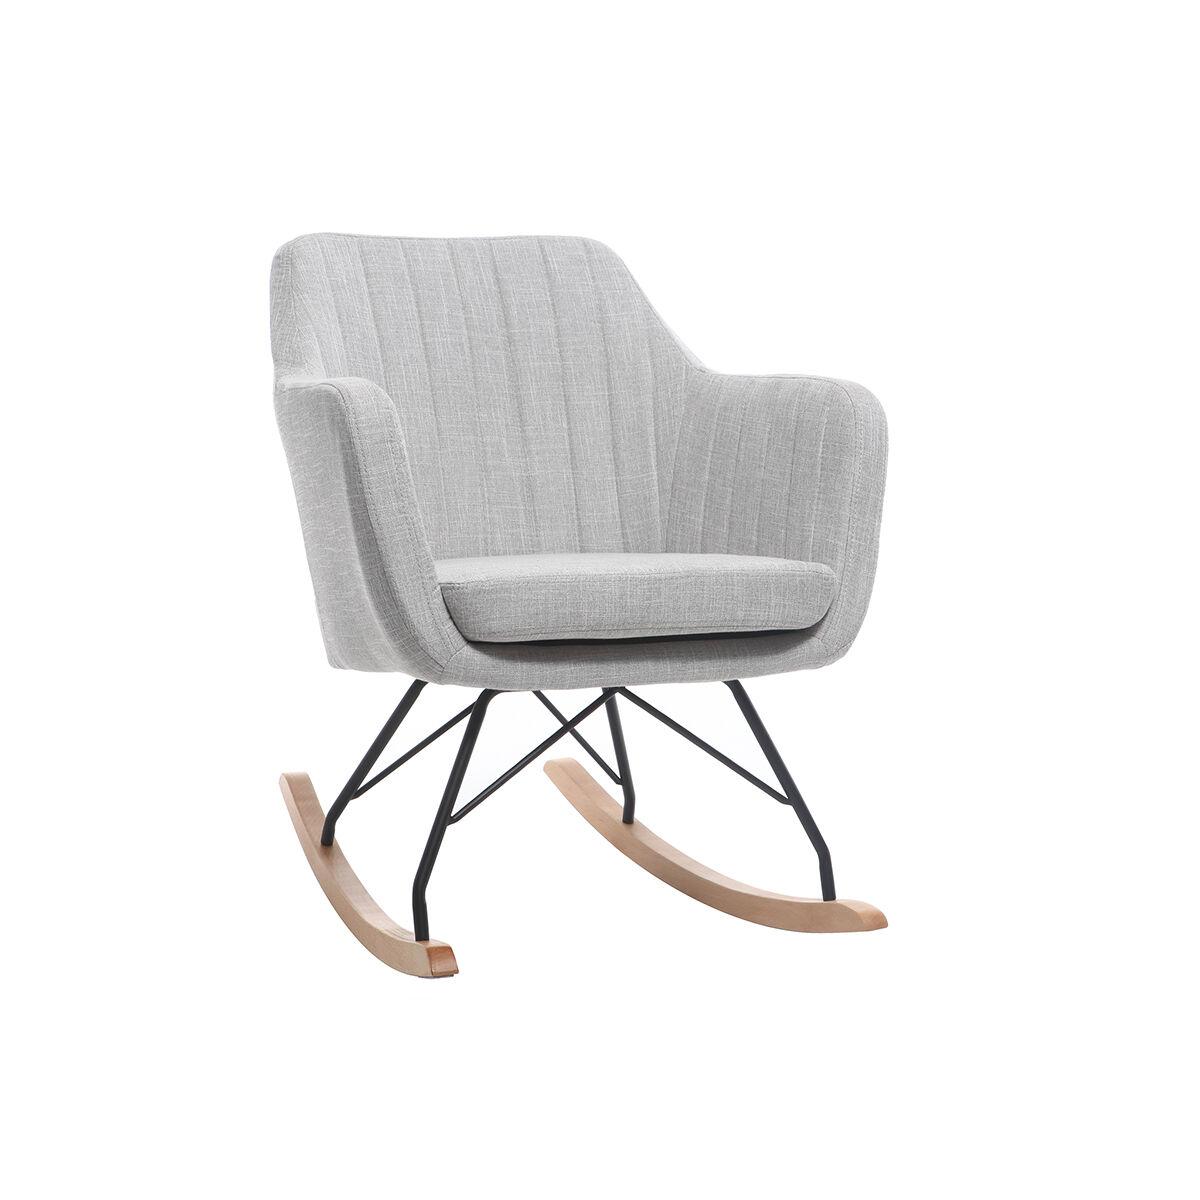 Miliboo Rocking chair scandinave en tissu gris clair ALEYNA